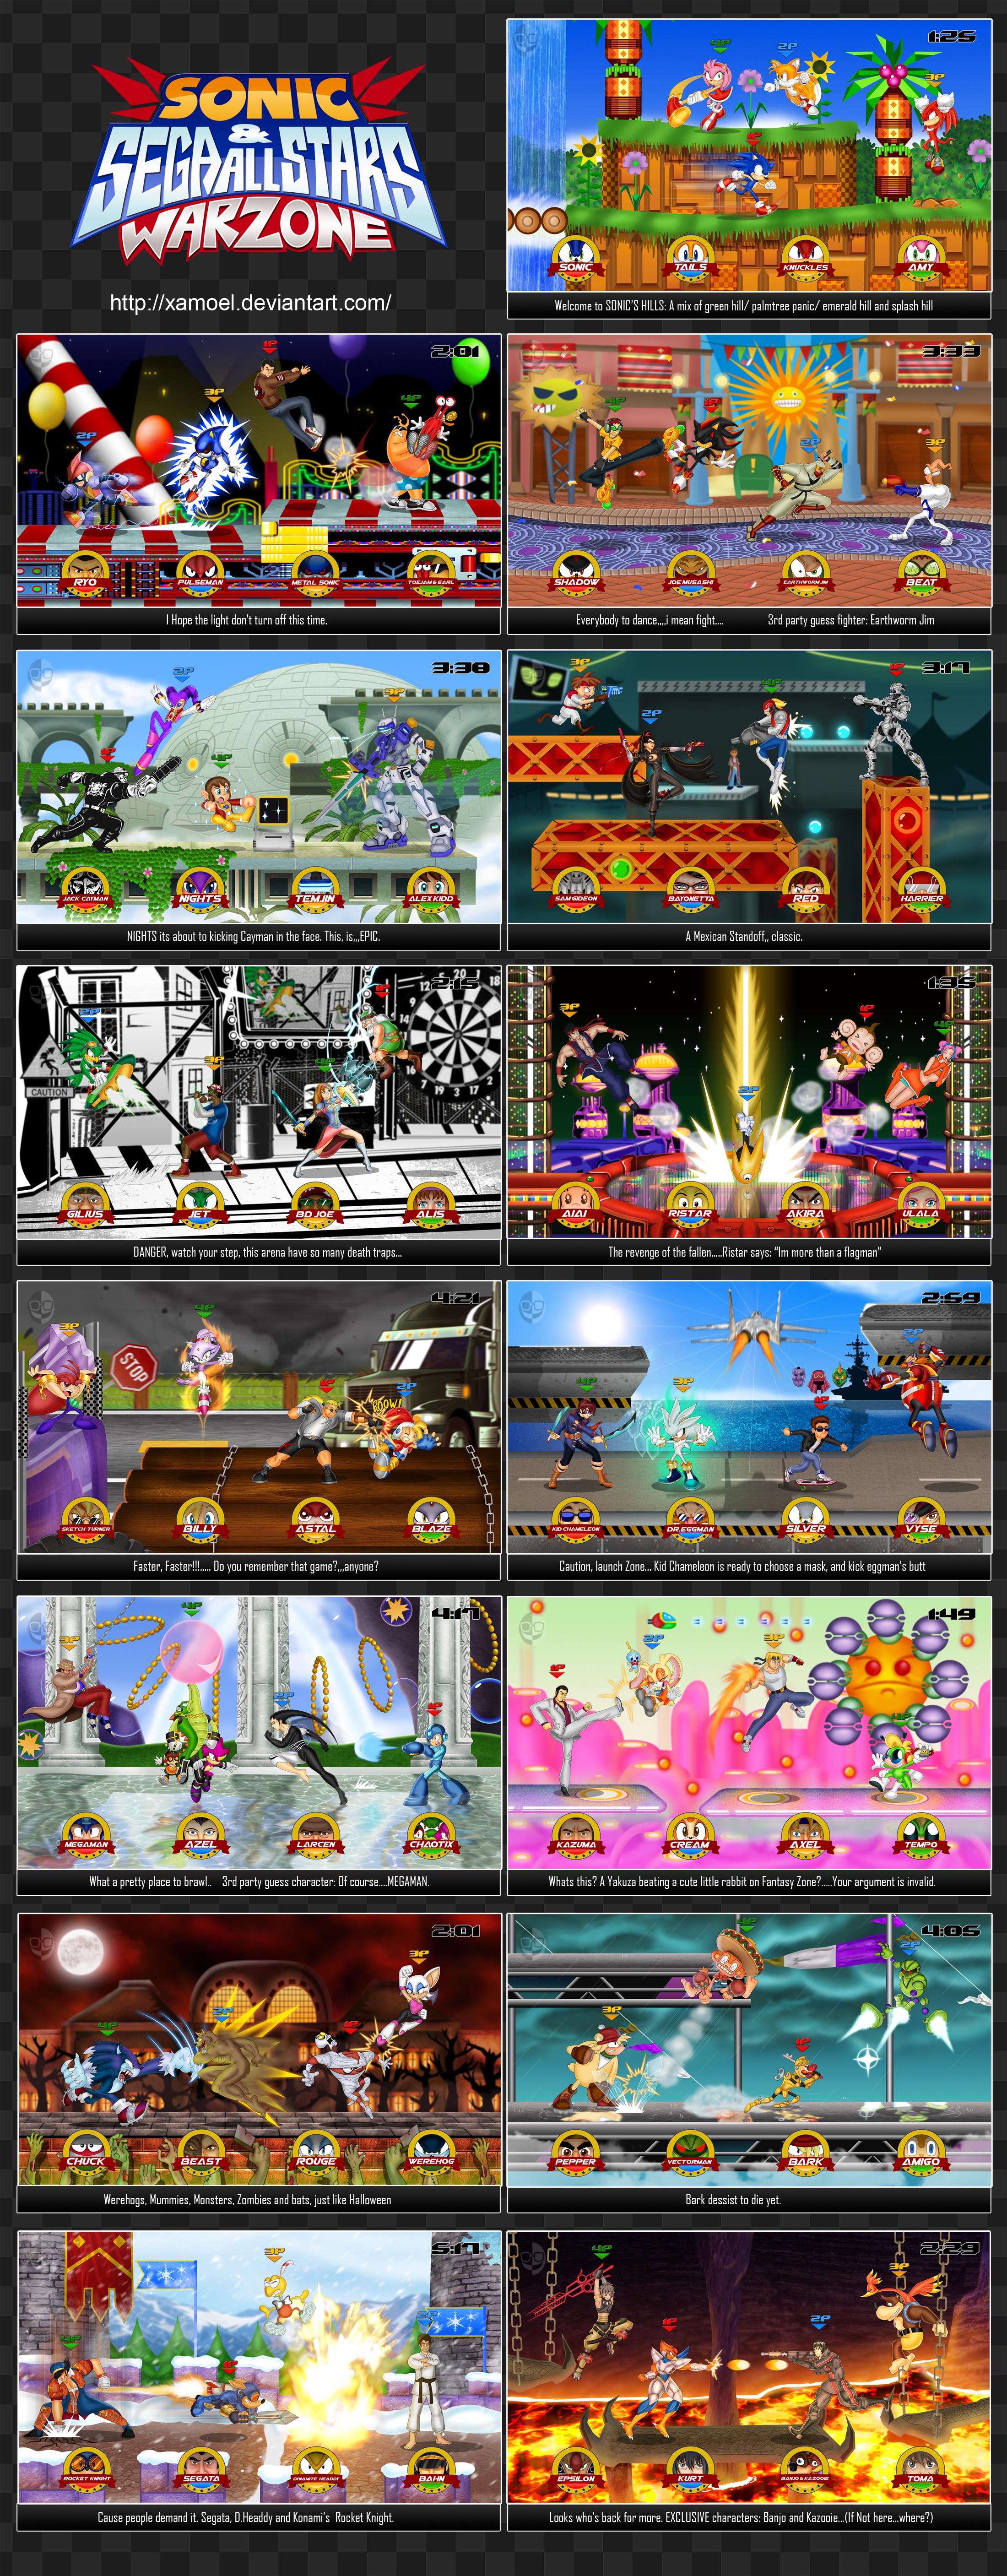 Sega All Stars fighting game? Sonic_and_sega_all_star_warzone_by_xamoel-d5ijzkq